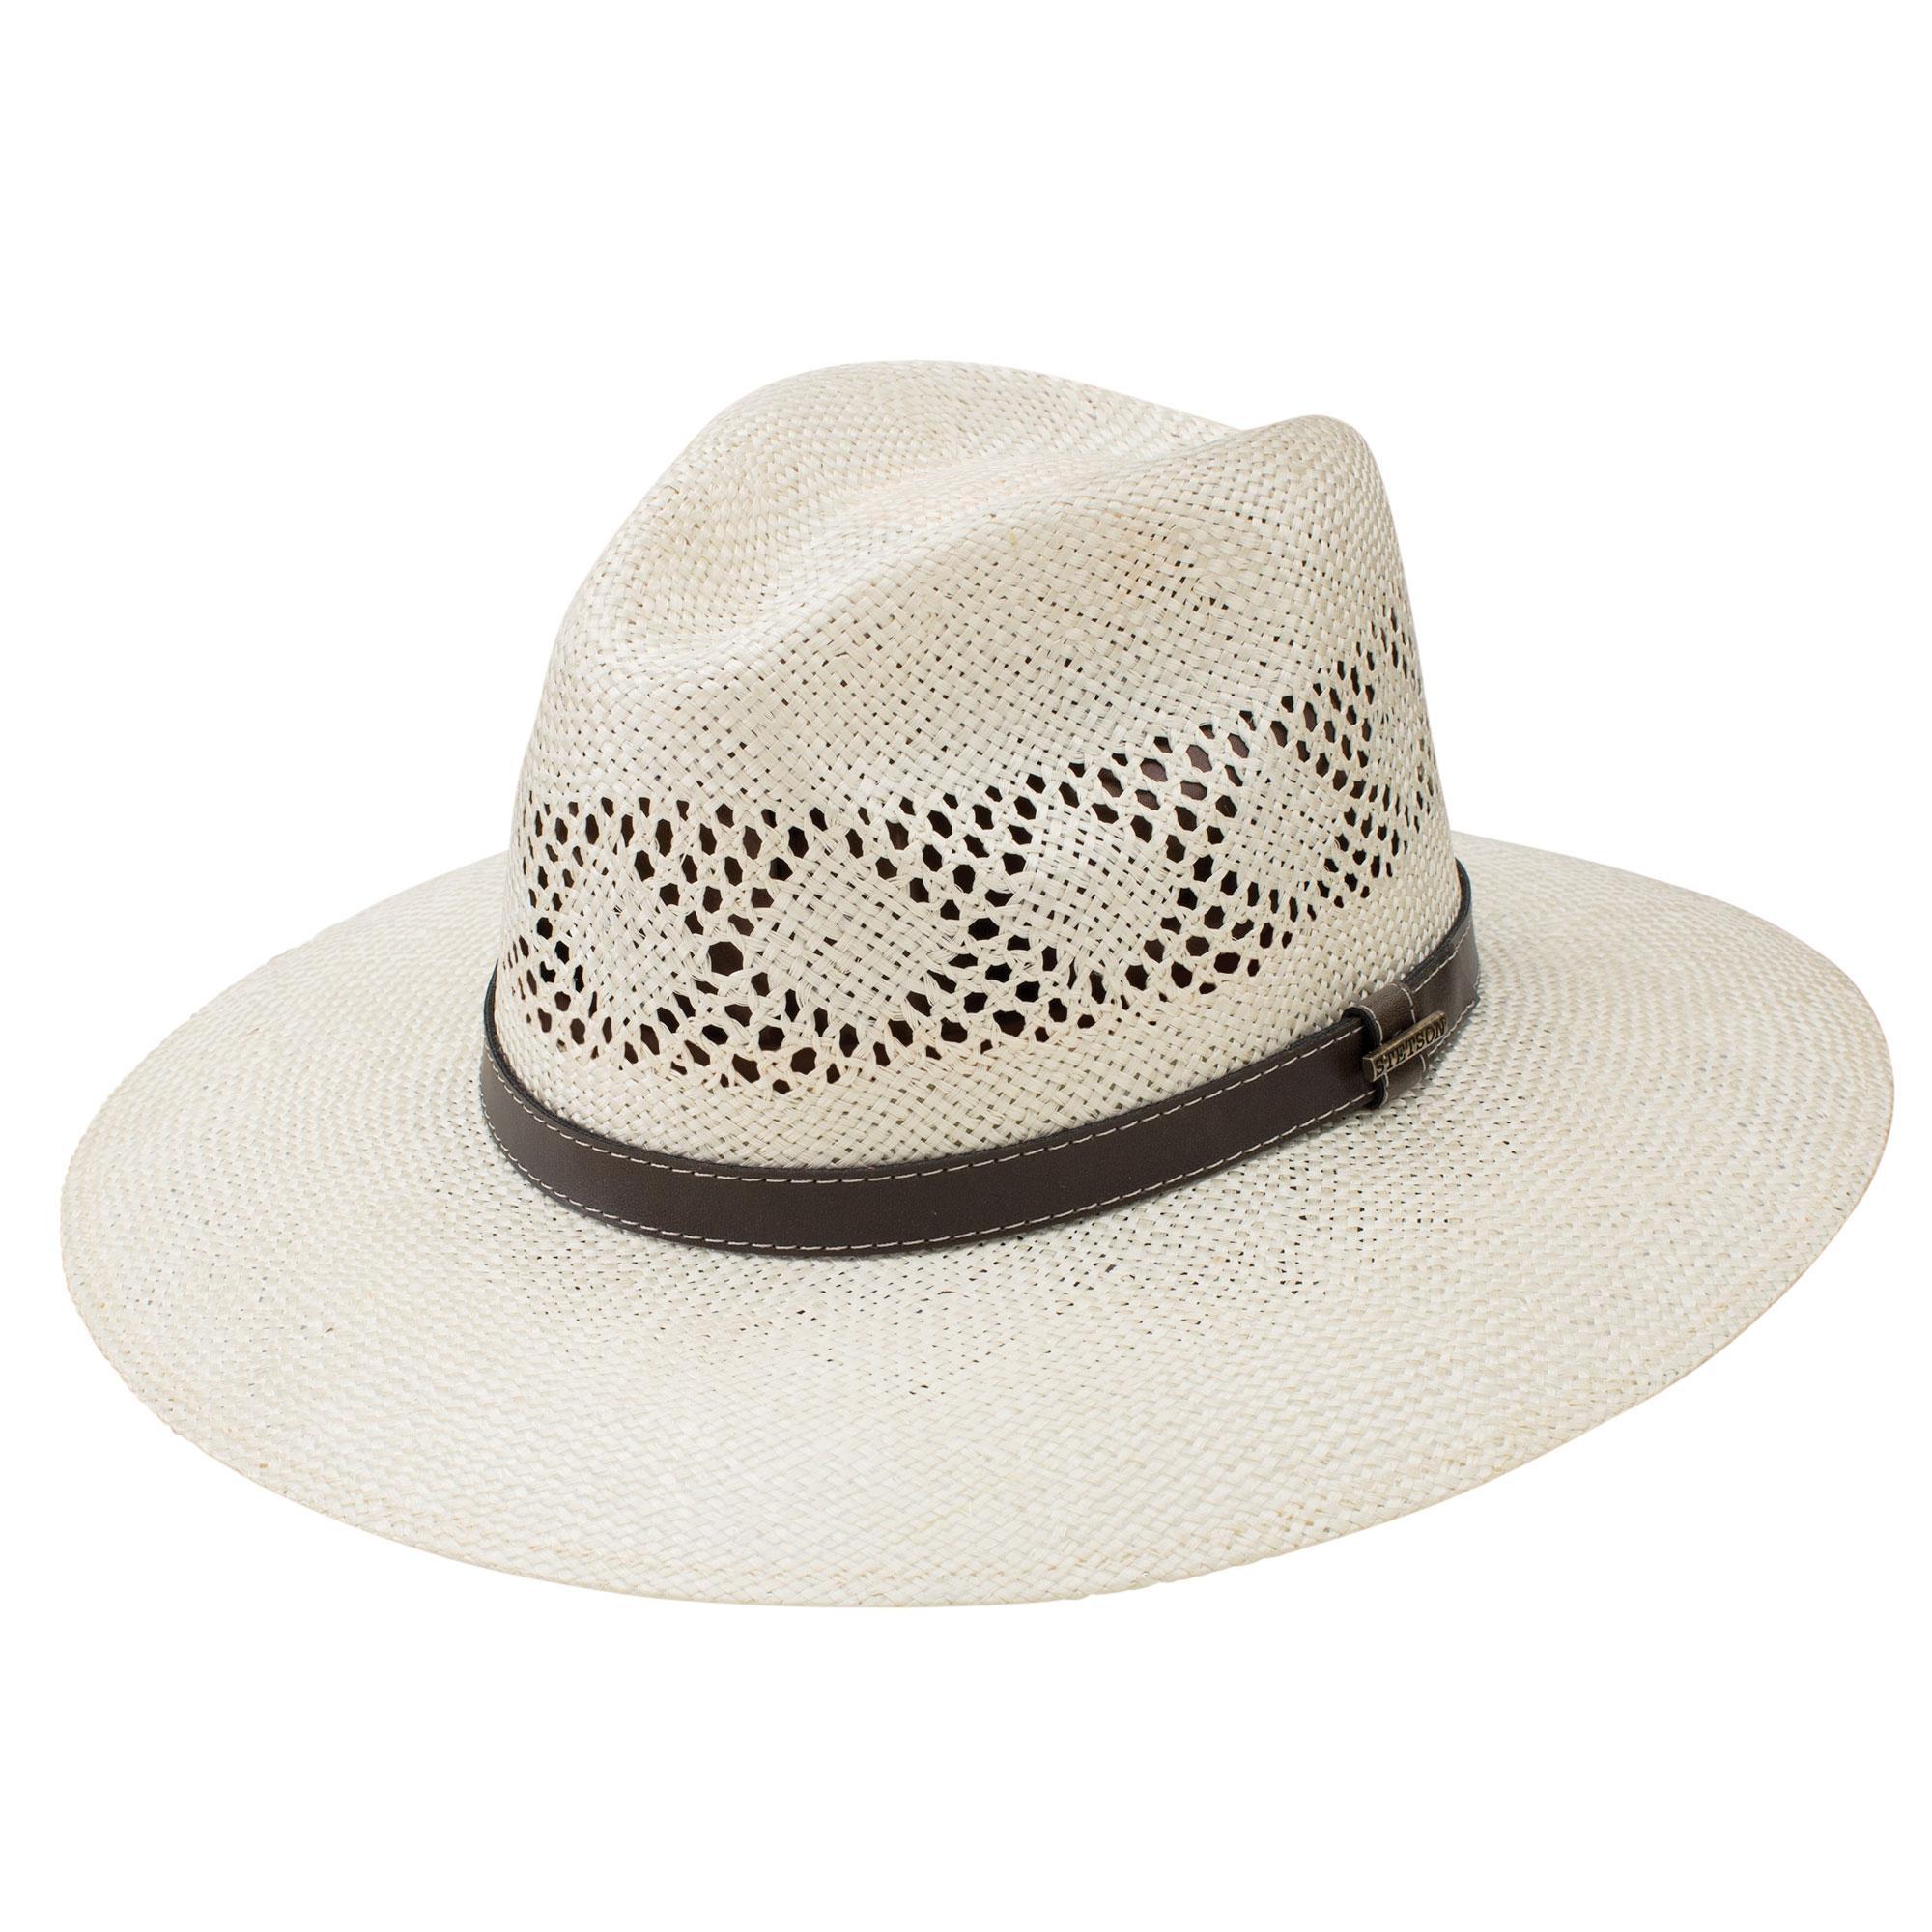 Stetson Carolina - Shantung Outdoorsman Hat